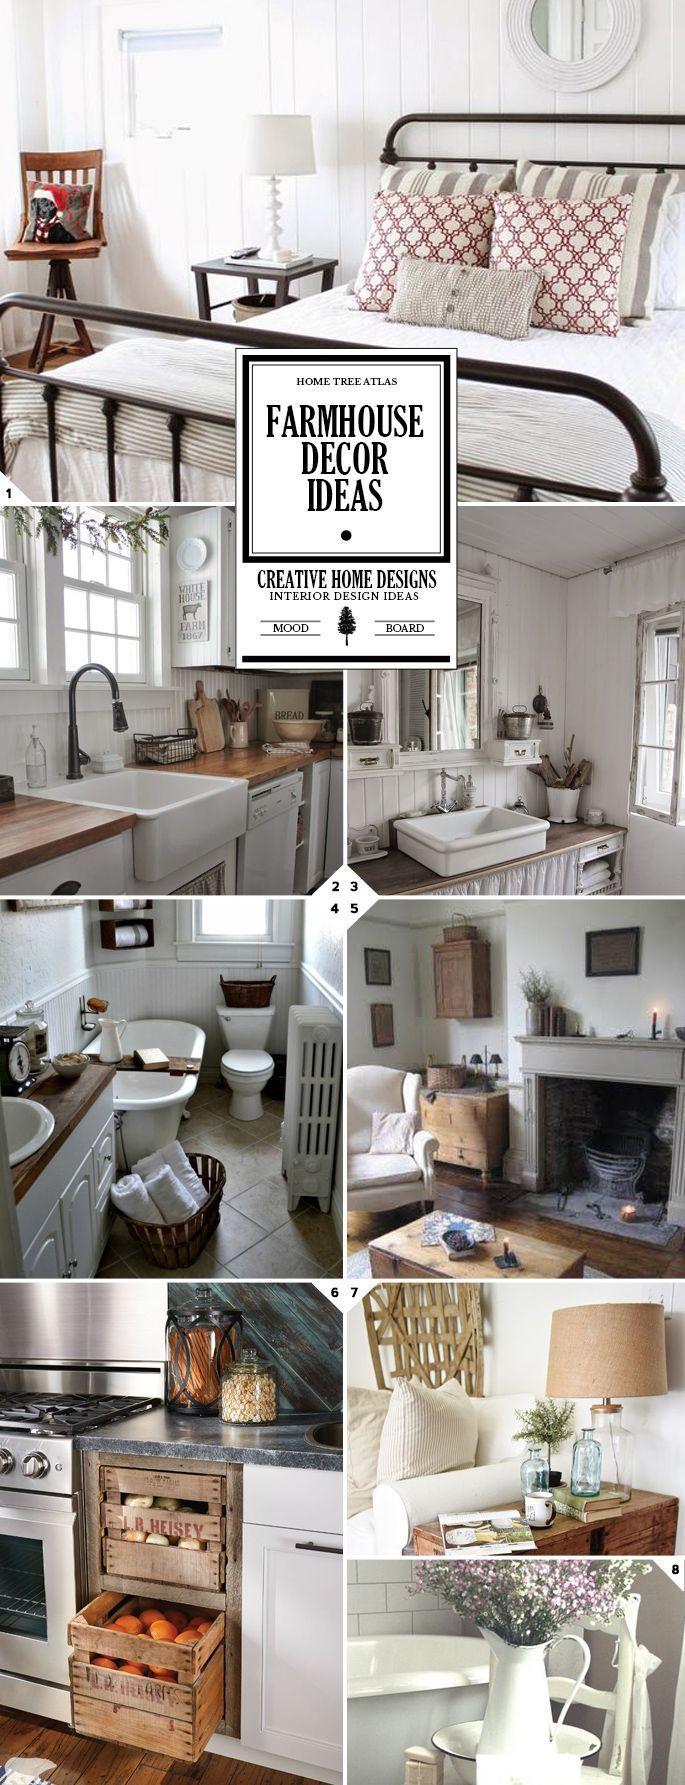 best farmhouse images on pinterest house siding modern house